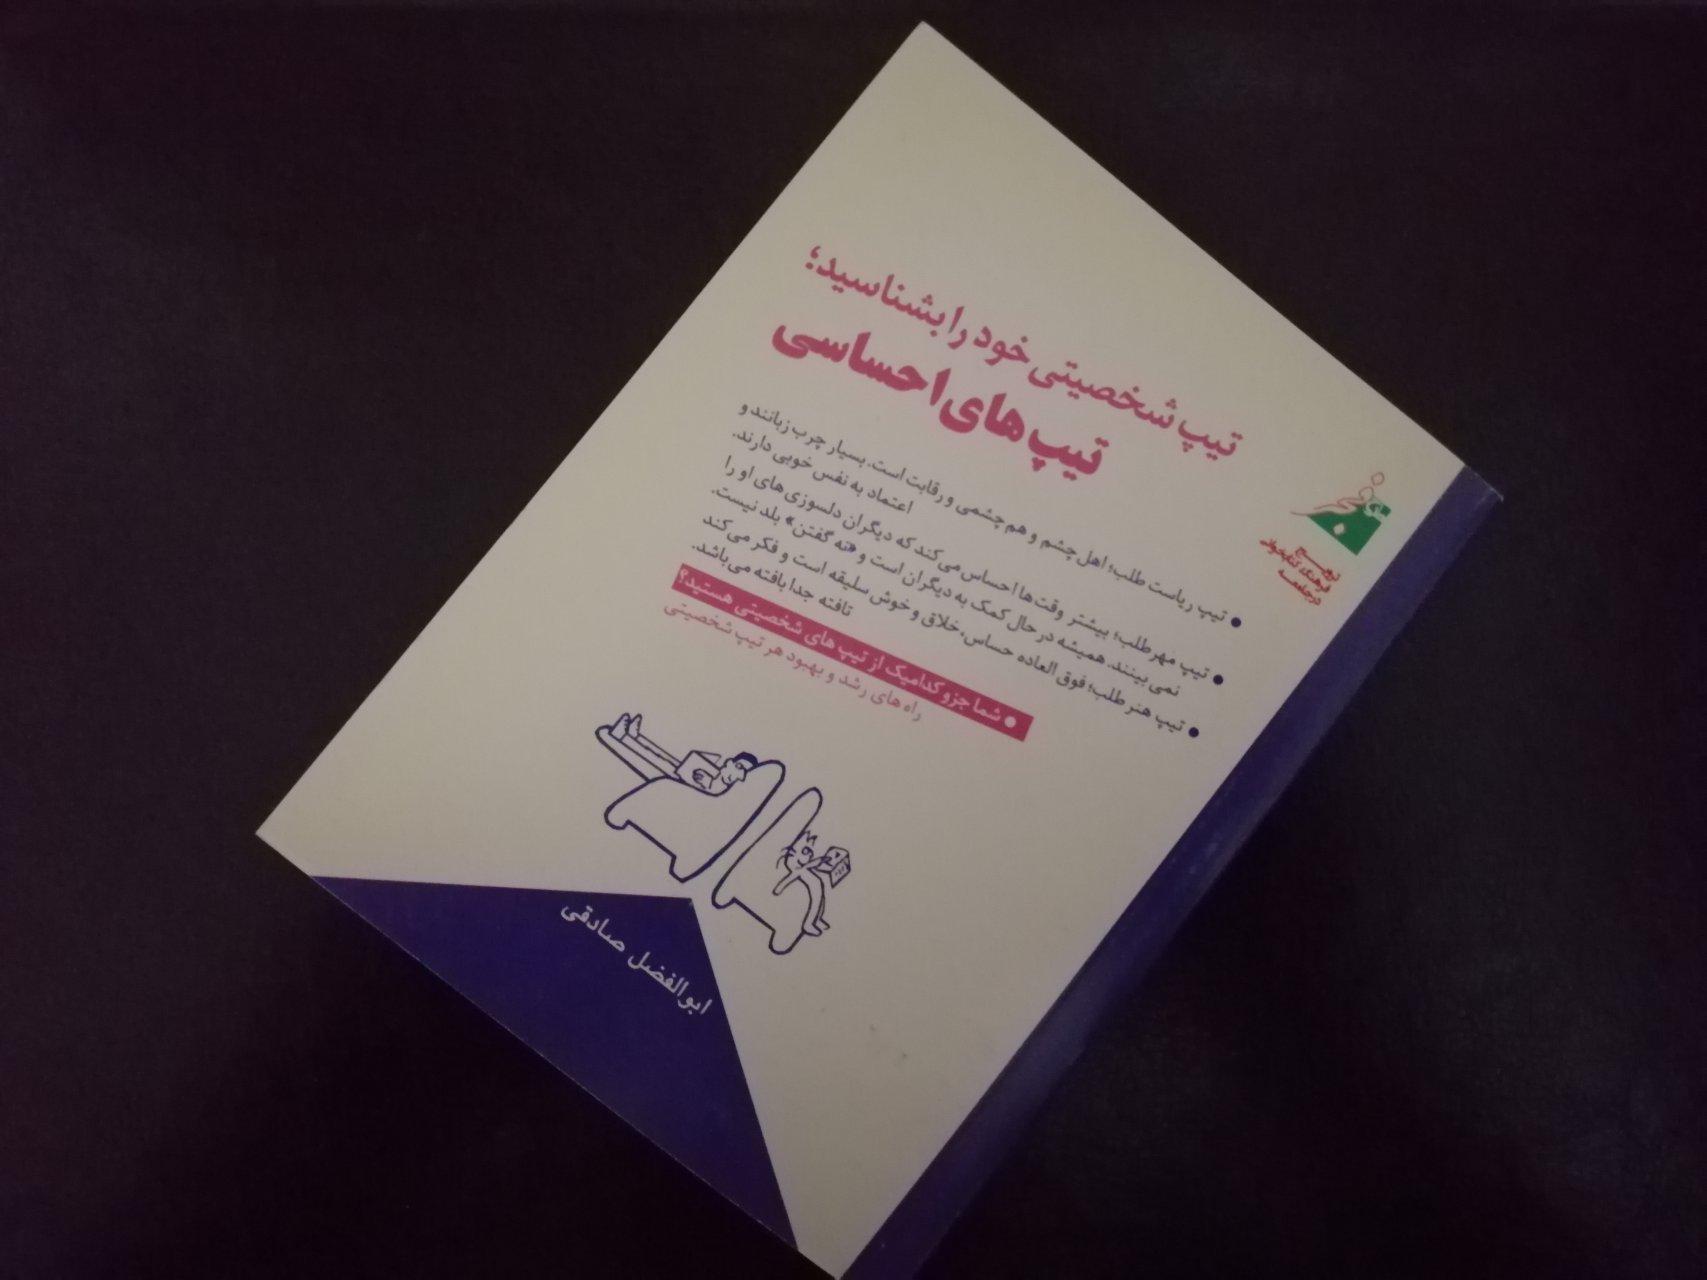 کتاب الکترونیکی تیپهای احساسی اثر ابوالفضل صادقی